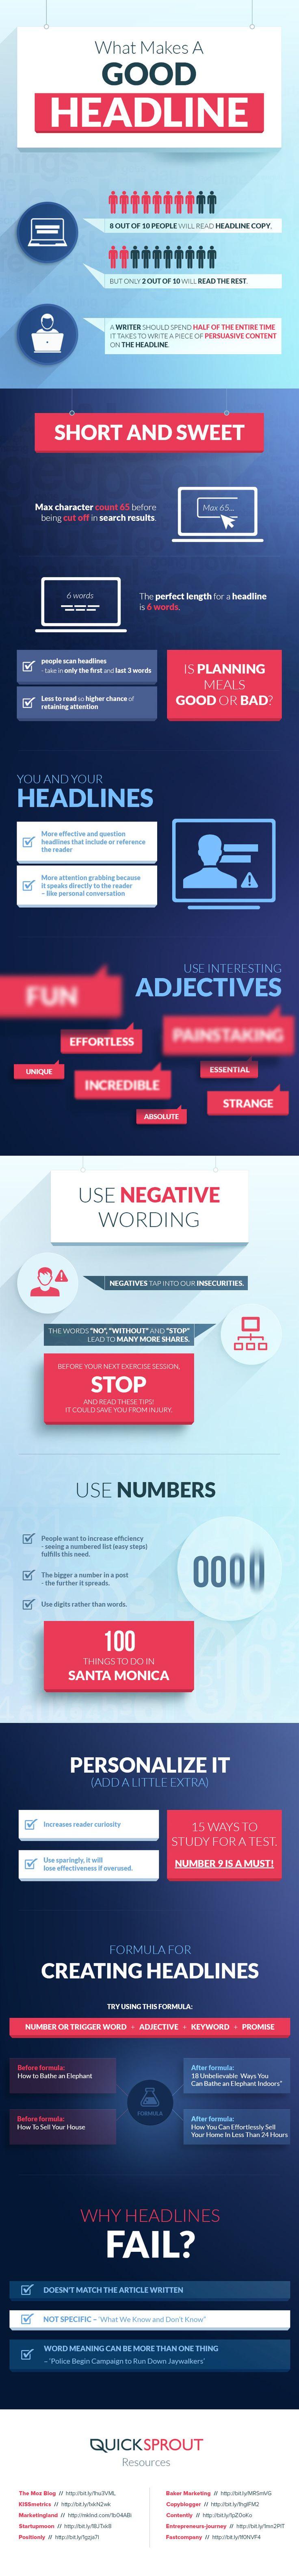 2 Killer Guidelines in Copywriting